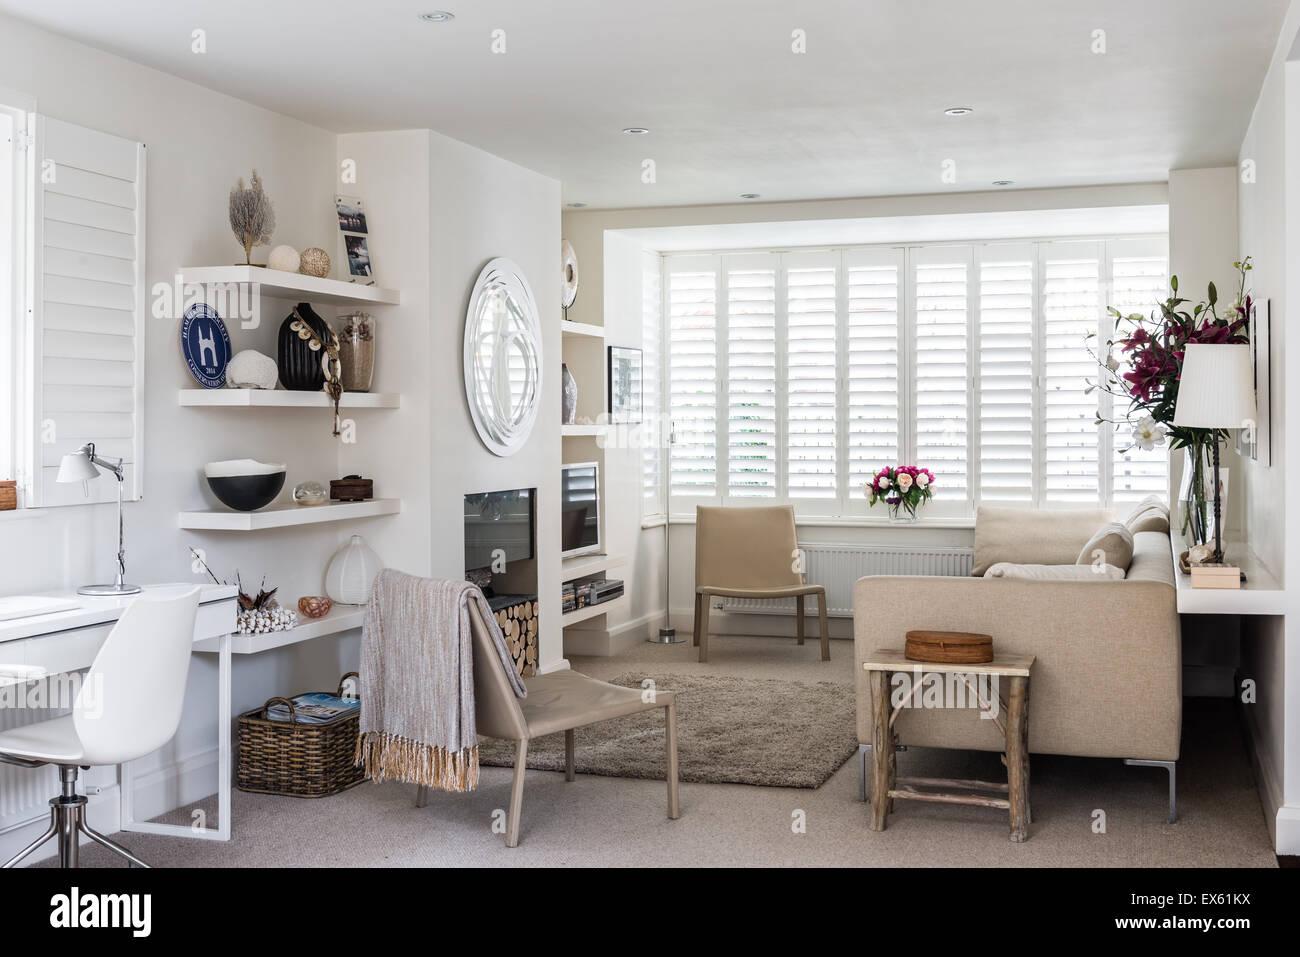 b und b italia top bb italia with b und b italia. Black Bedroom Furniture Sets. Home Design Ideas